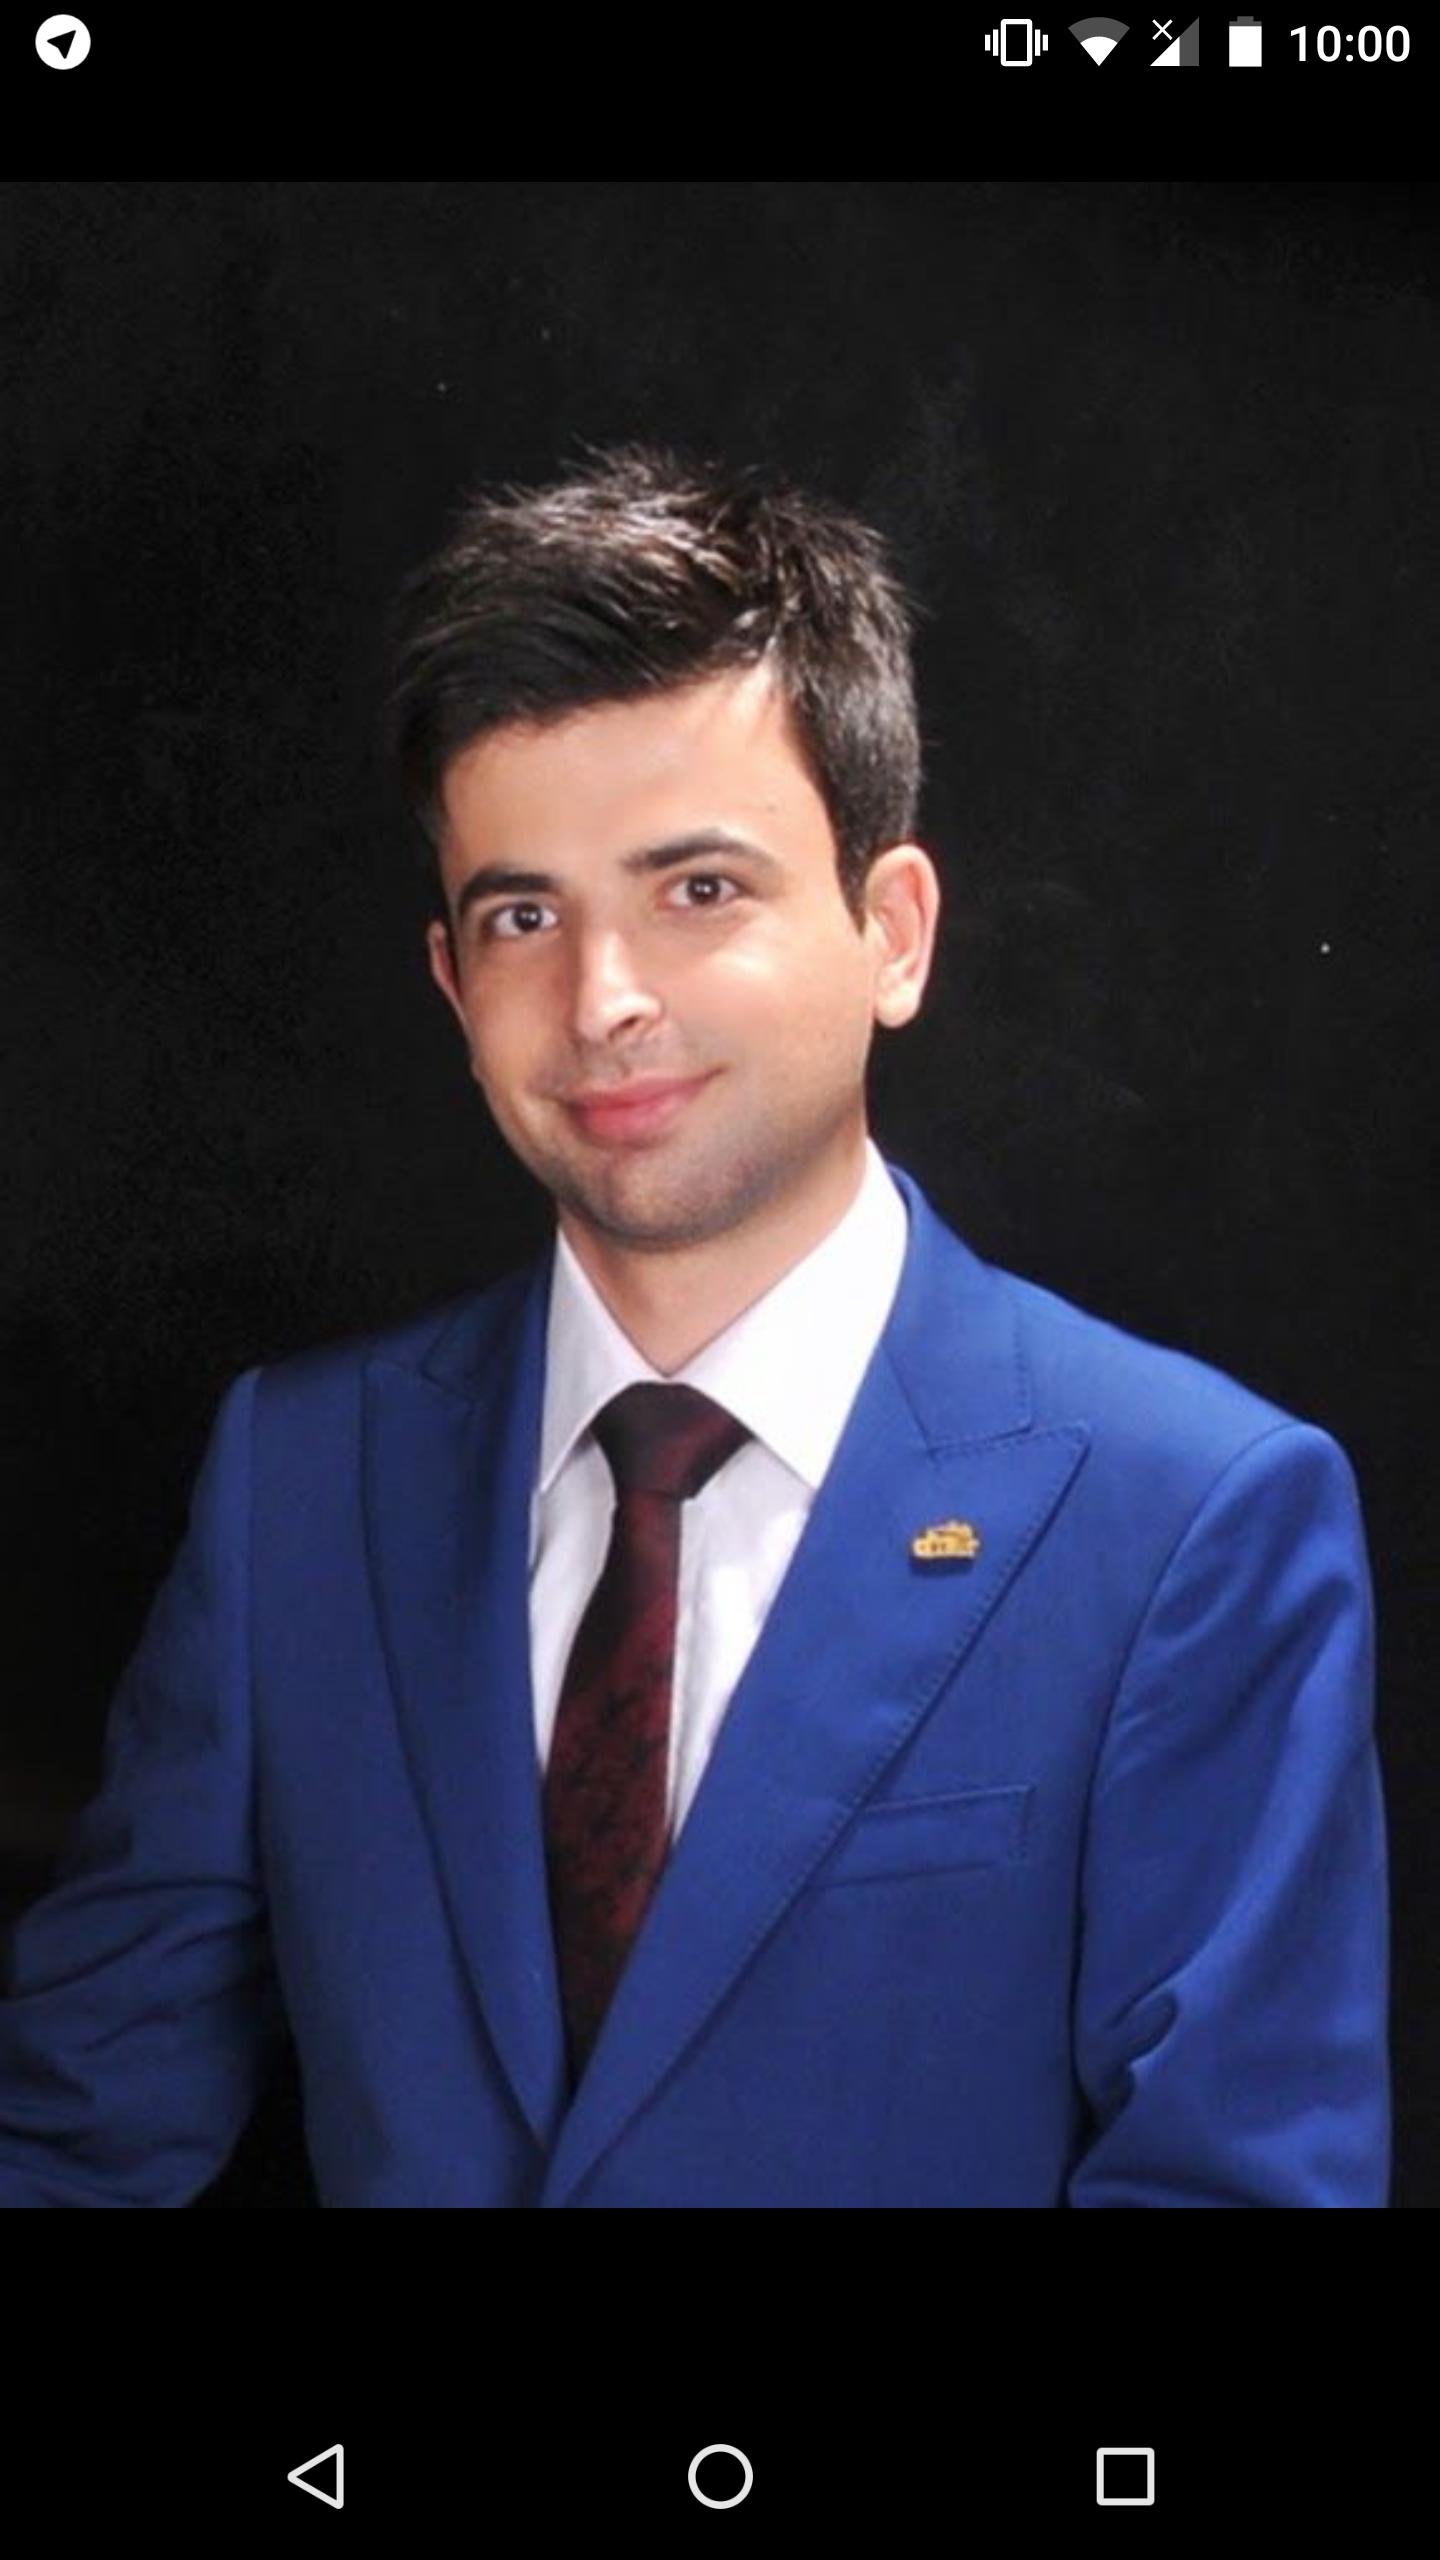 Amid Aliaghazadeh